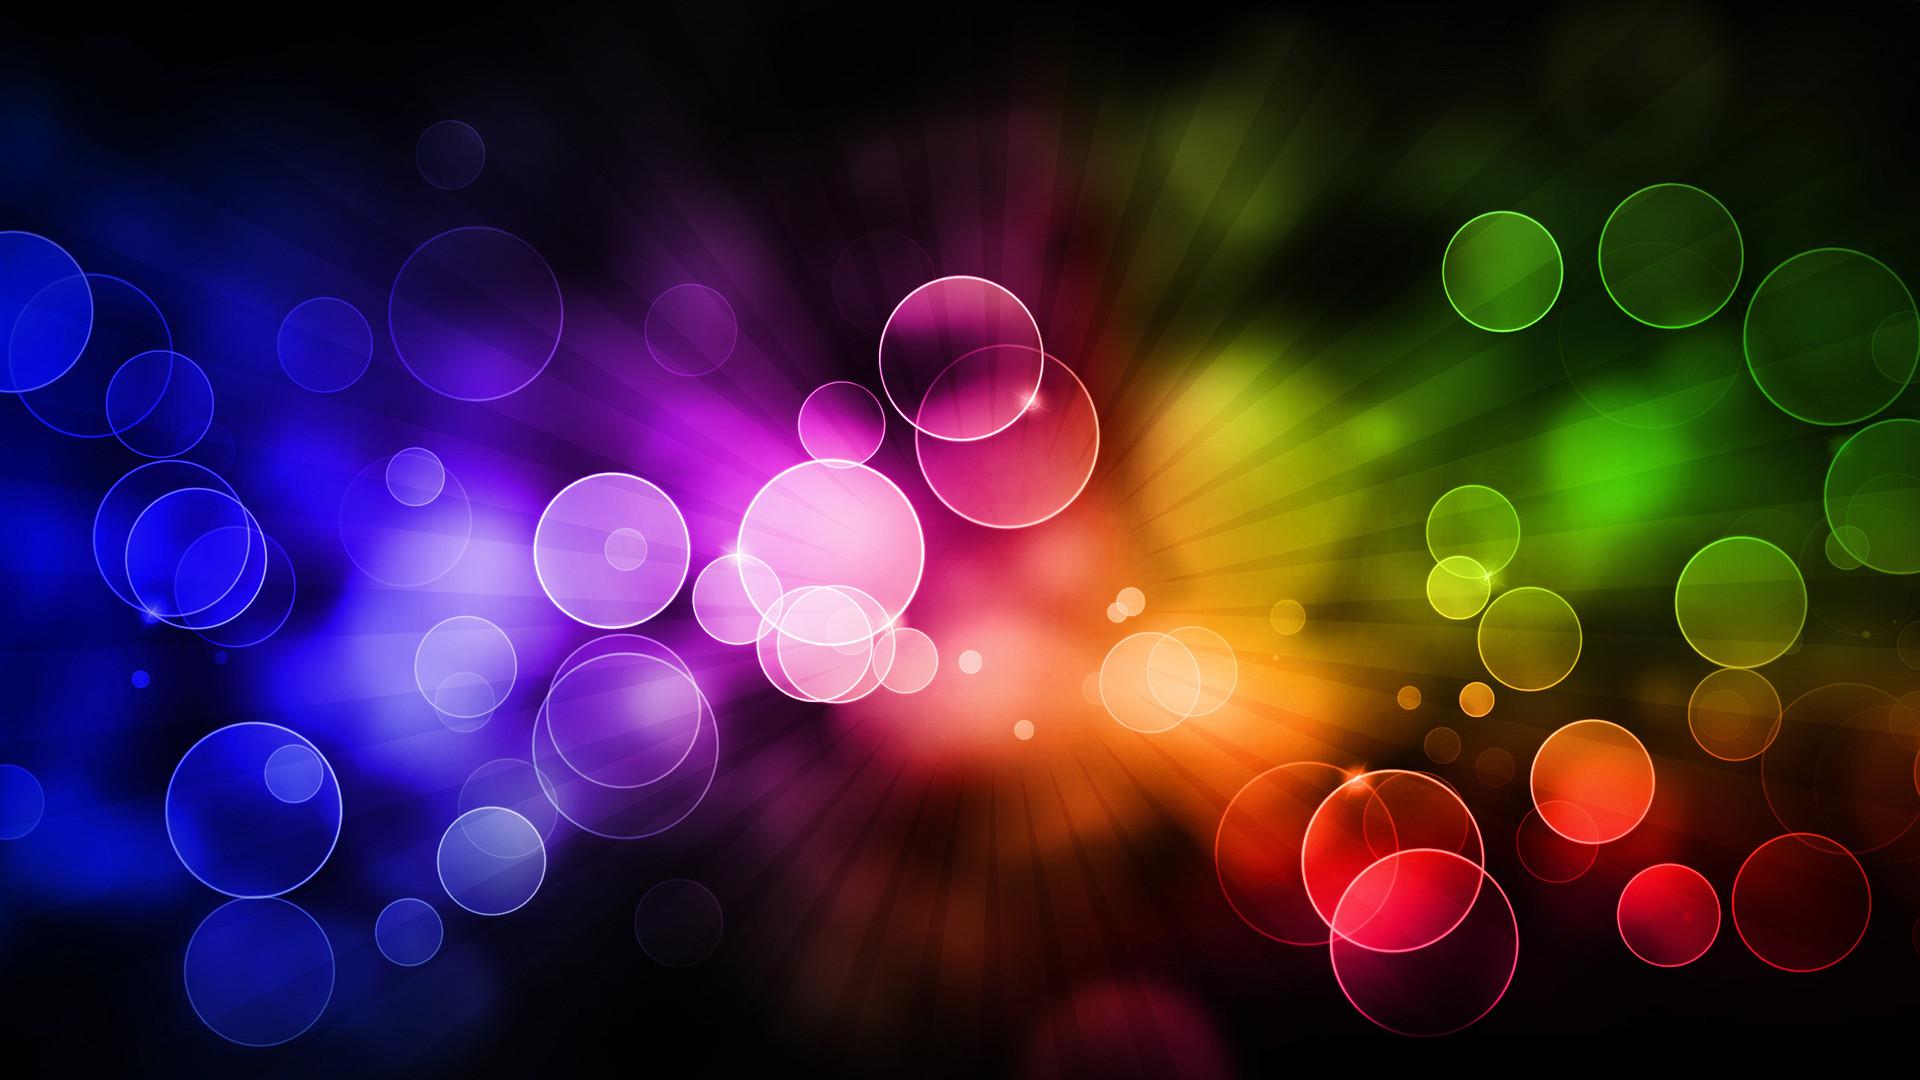 2560x1600 Wallpaper Rainbow Colorful Cross Lines